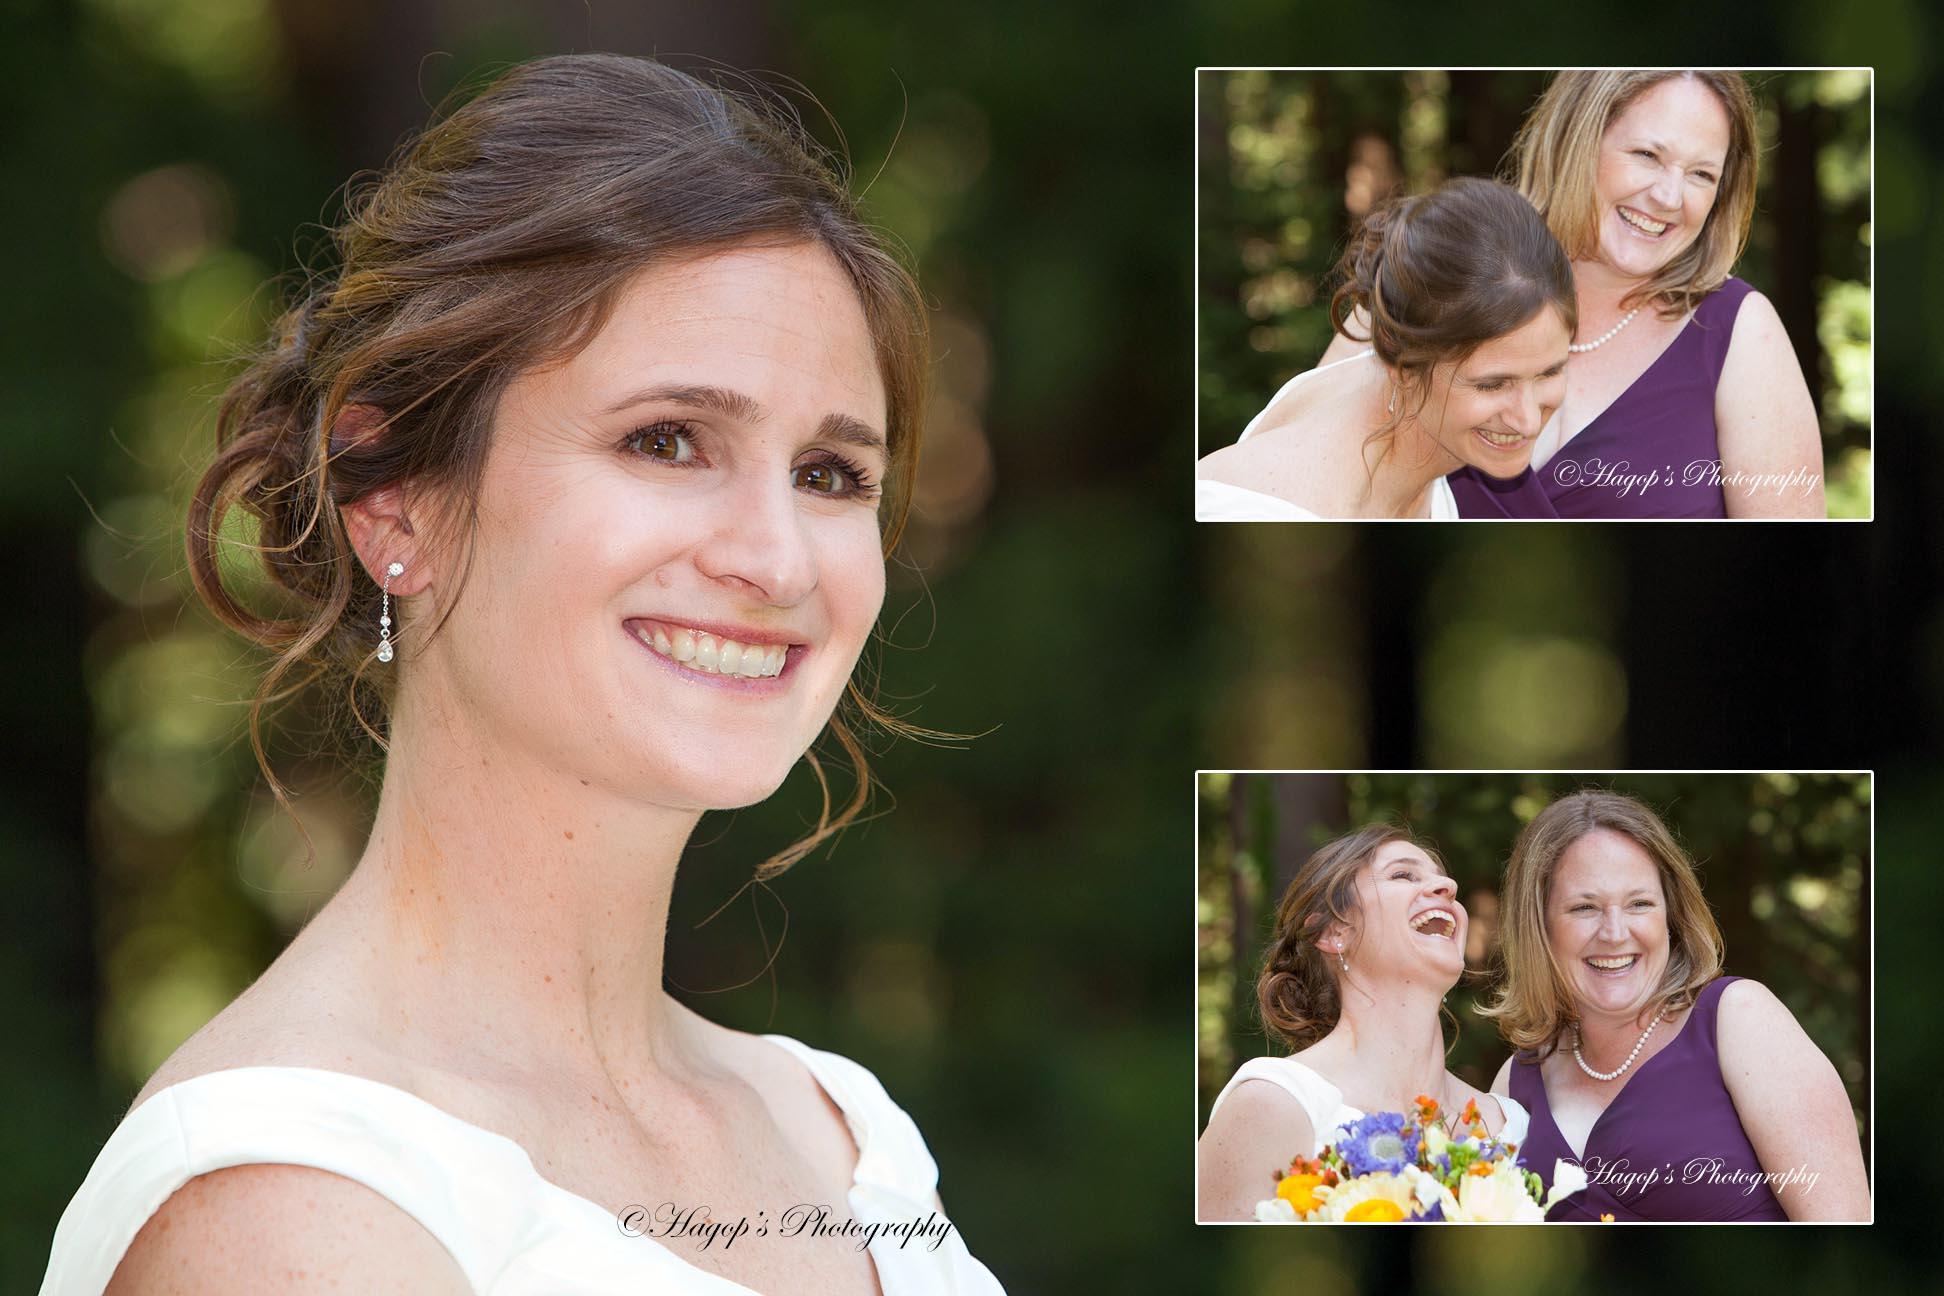 composite page of a bride's pre wedding photos with her bridesmaid